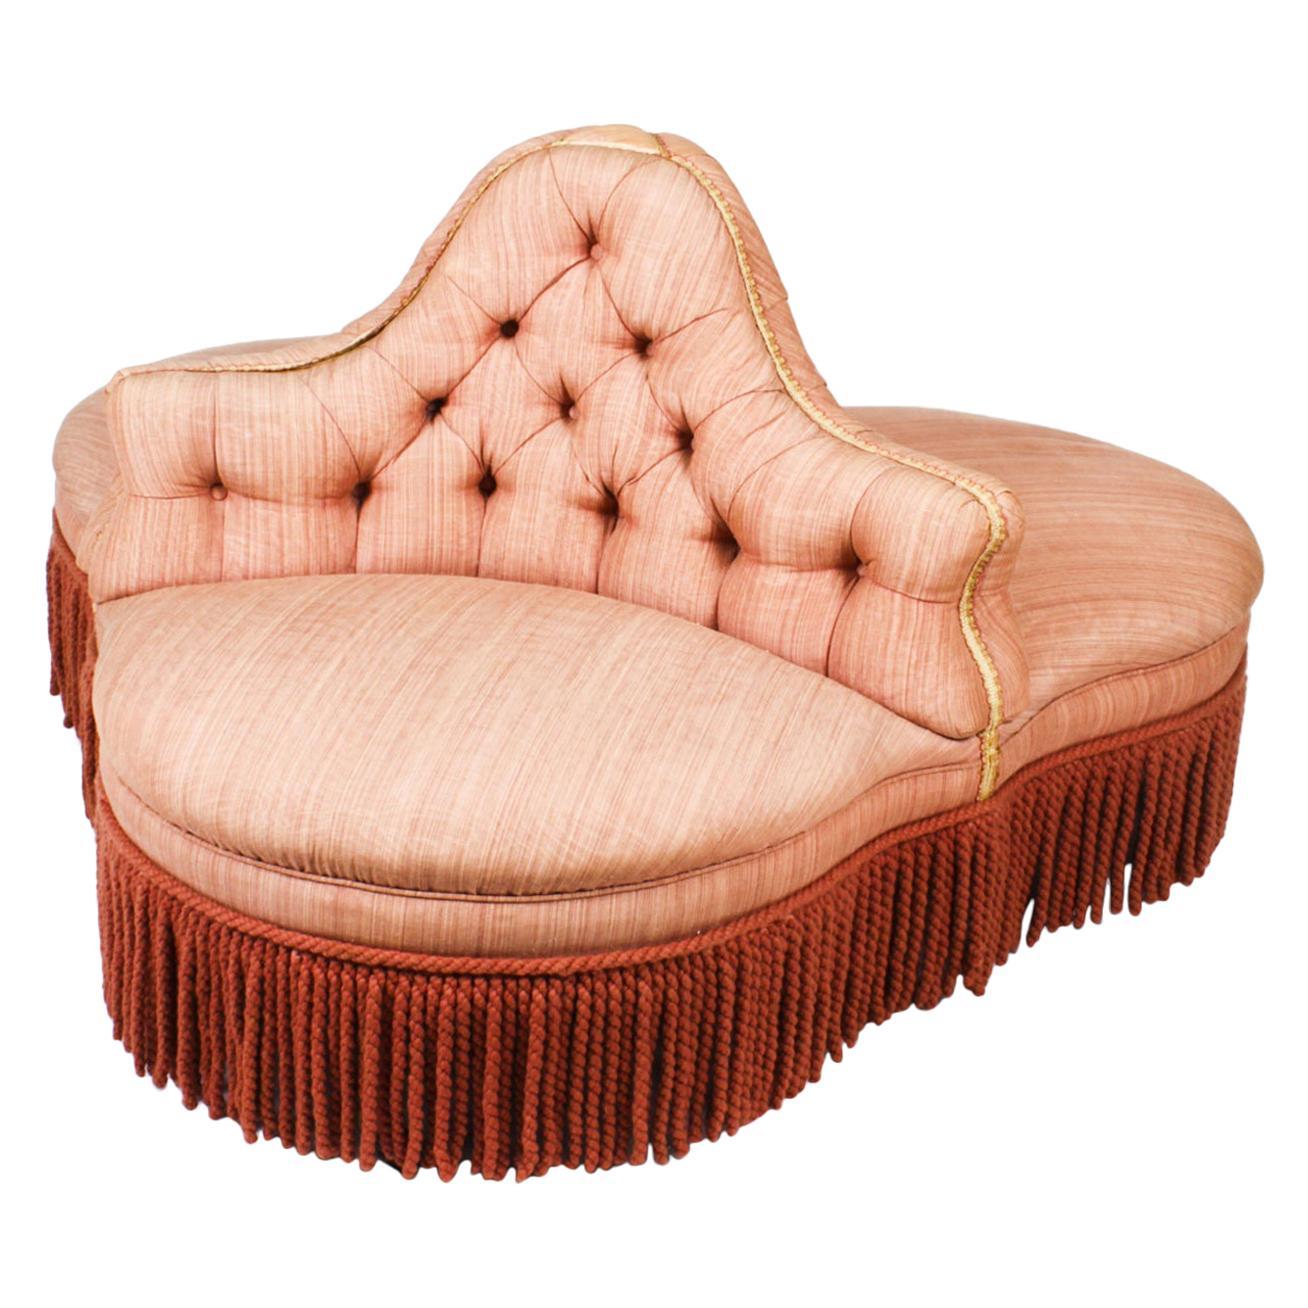 Antique Victorian Love Seat Conversation Settee, 19th Century